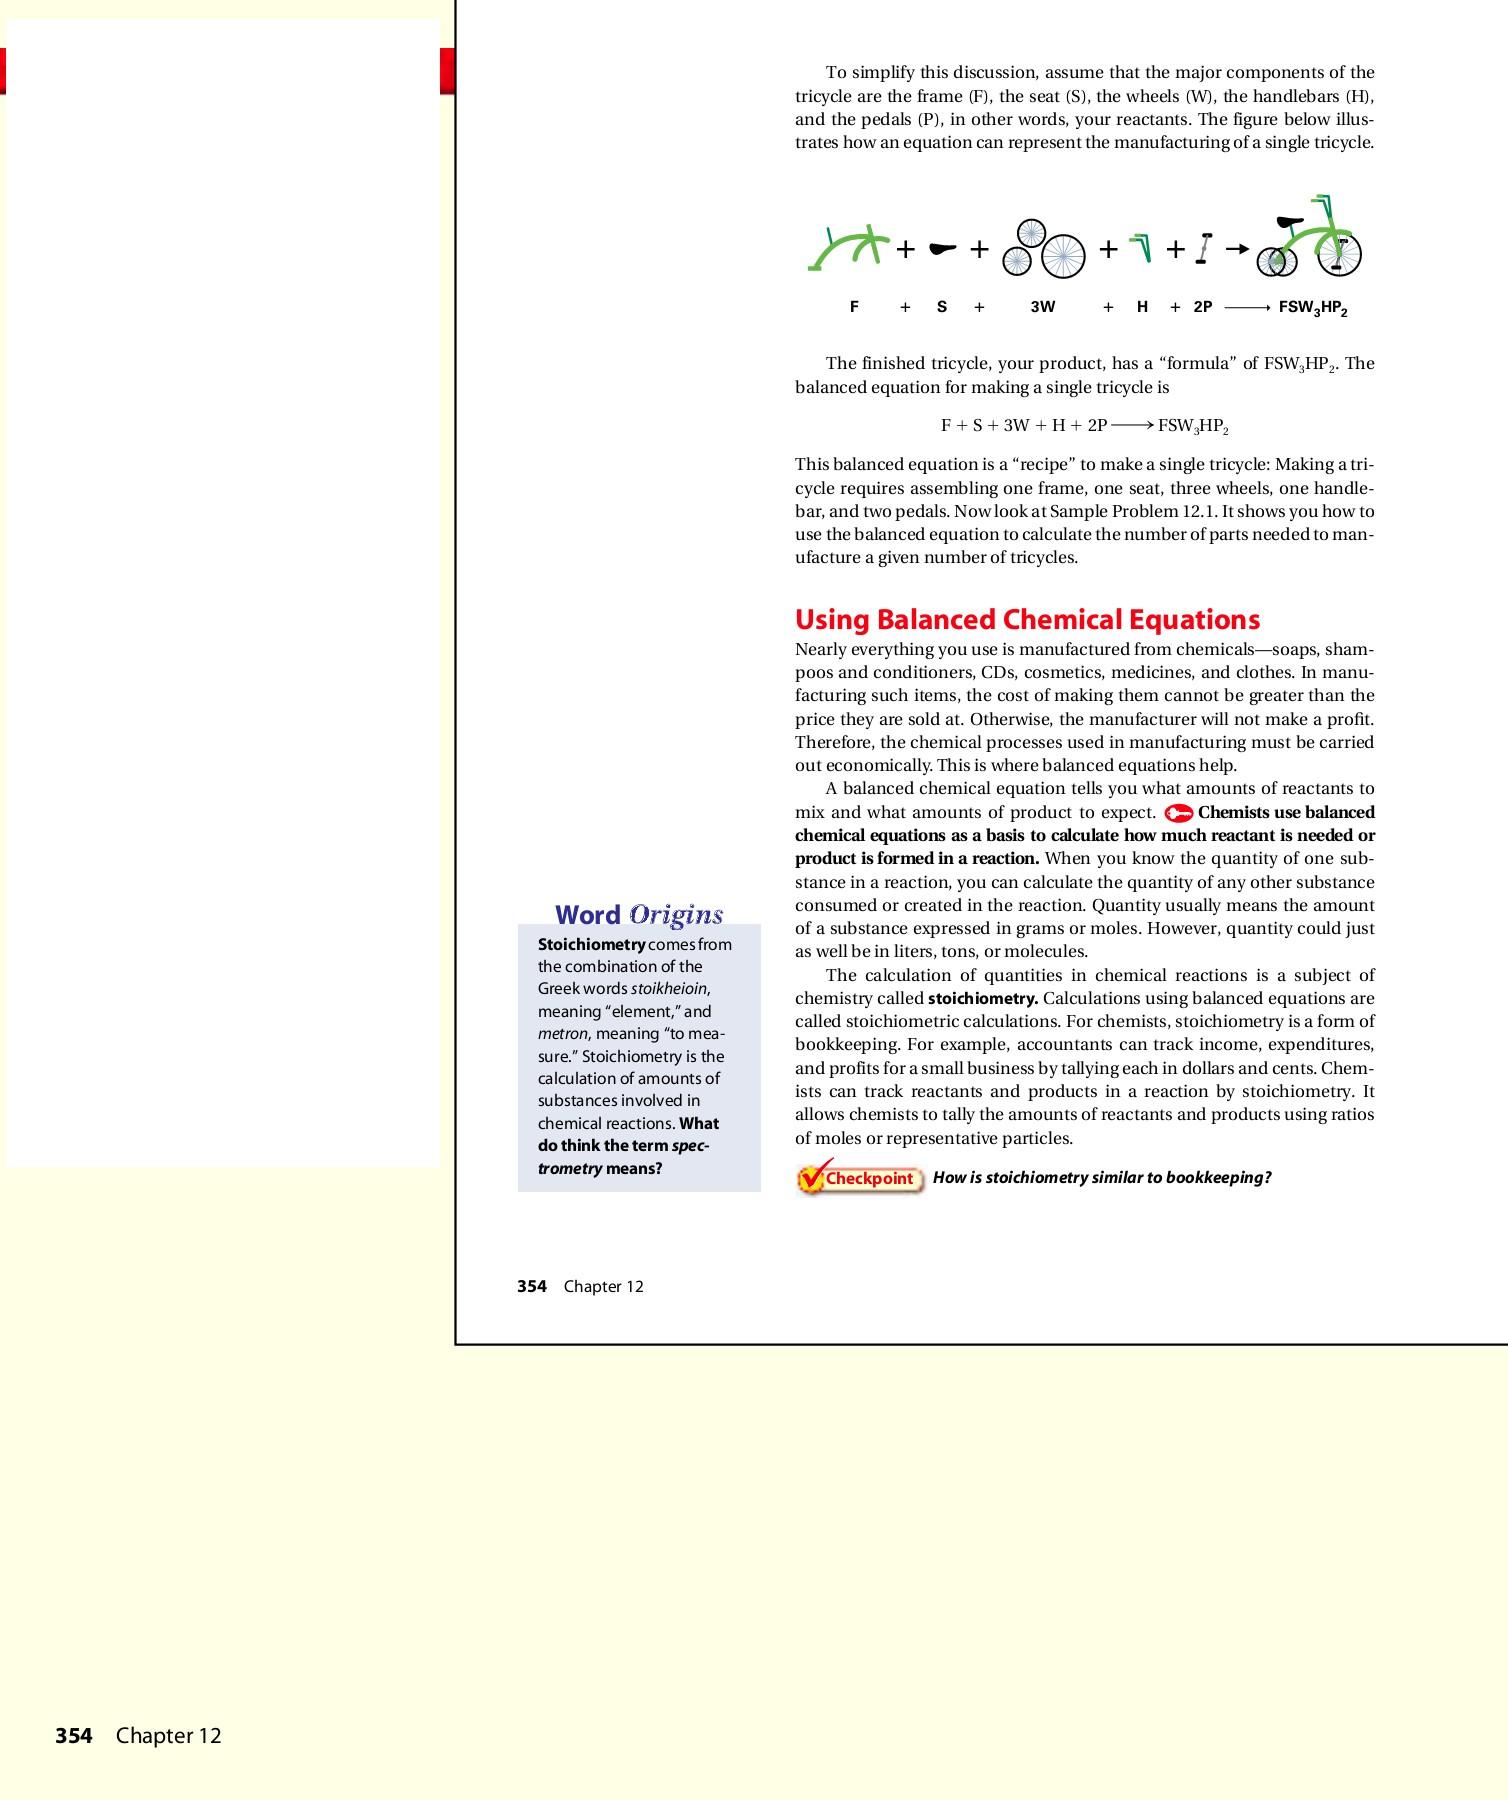 Stoichiometry Worksheet 2 Answer Key Paraphrasing My